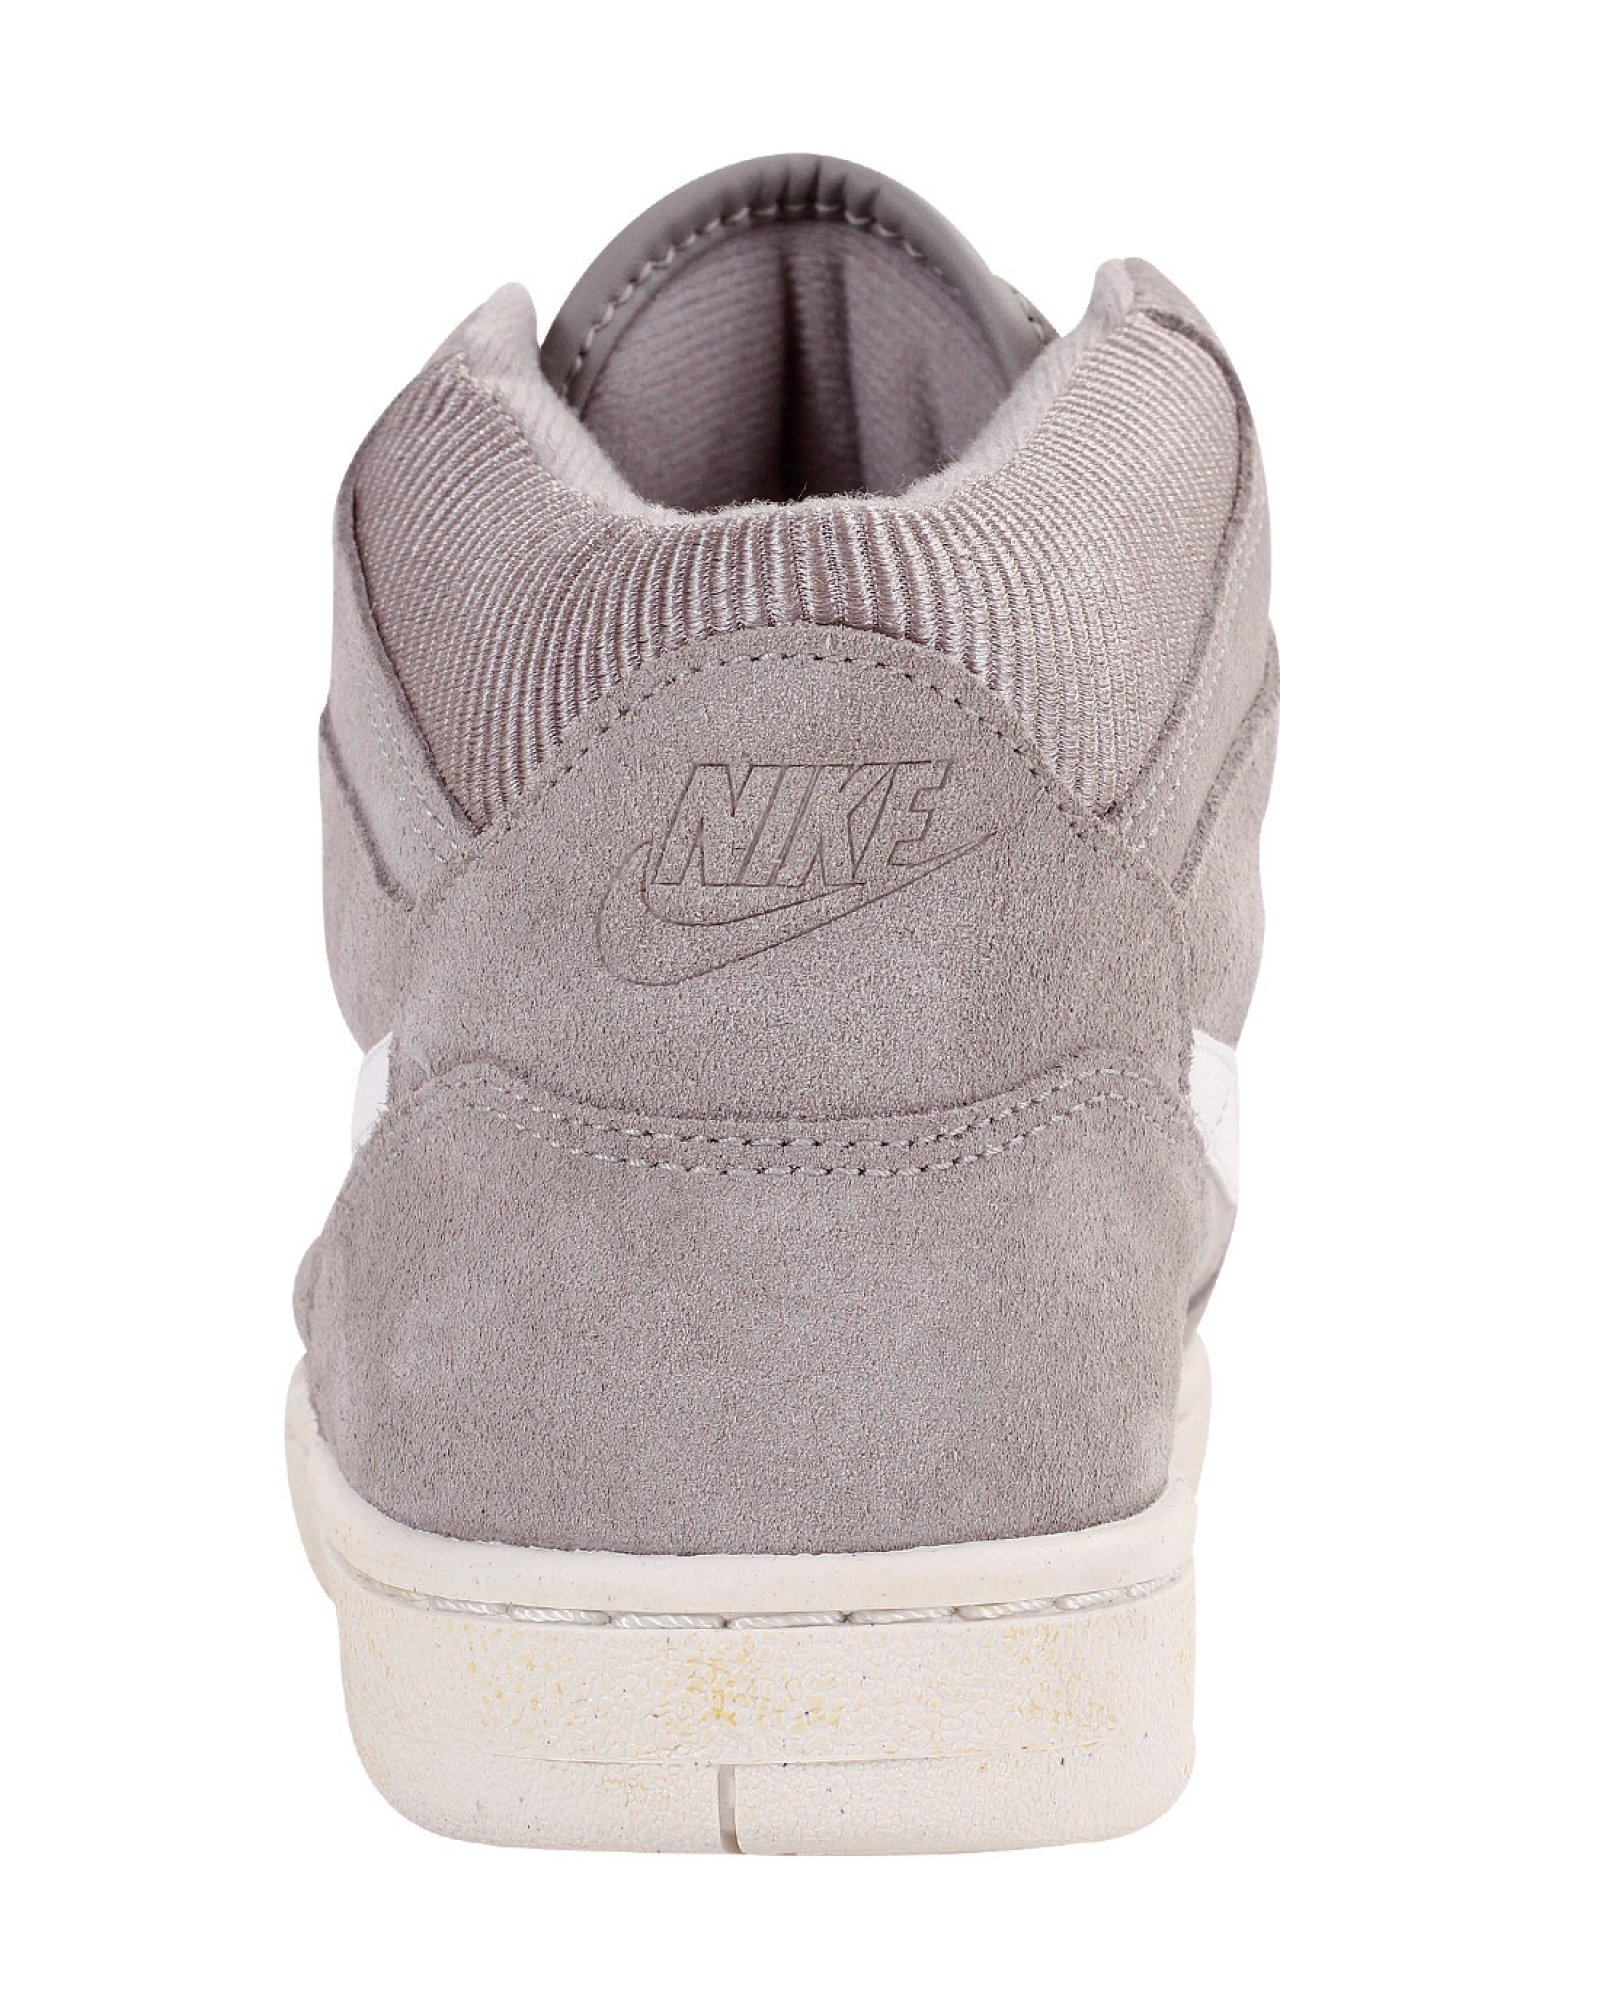 best sneakers df4aa 86443 ... Athletic Shoes  nike-sky-force-vintage-88-fall-2011-3 ...